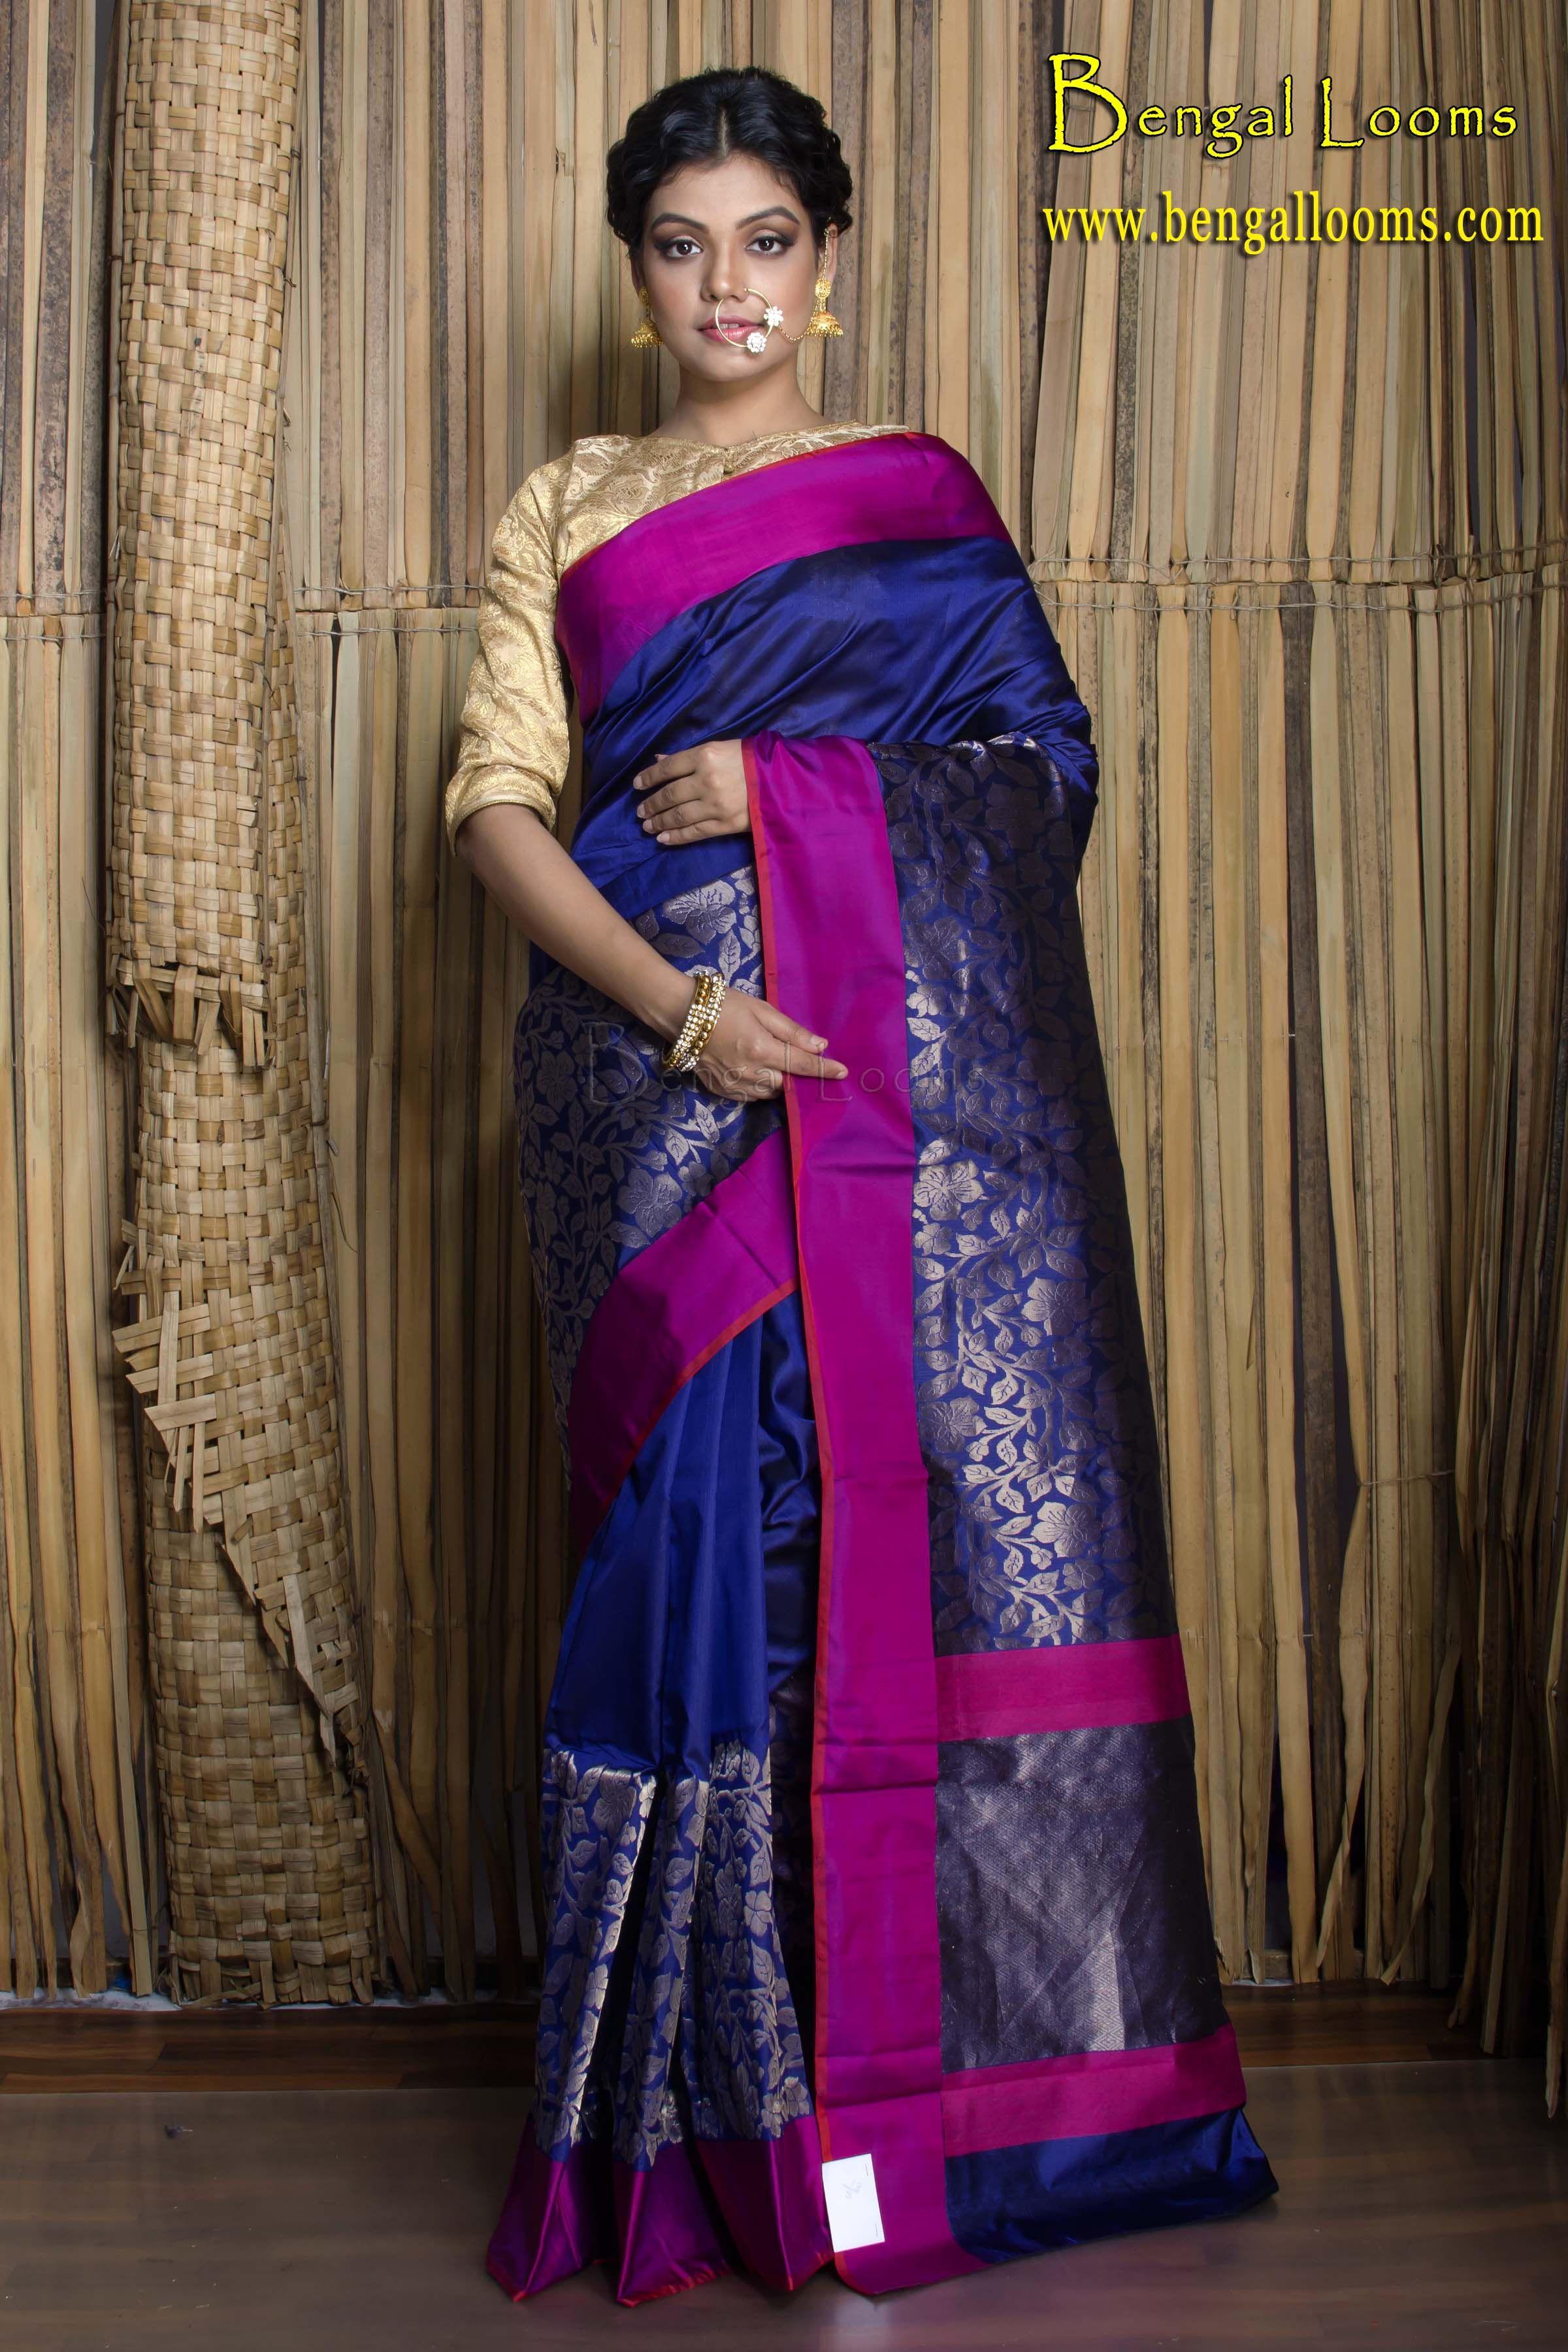 78c0fd1e55950 Pure Katan Silk Banarasi Saree in Navy Blue